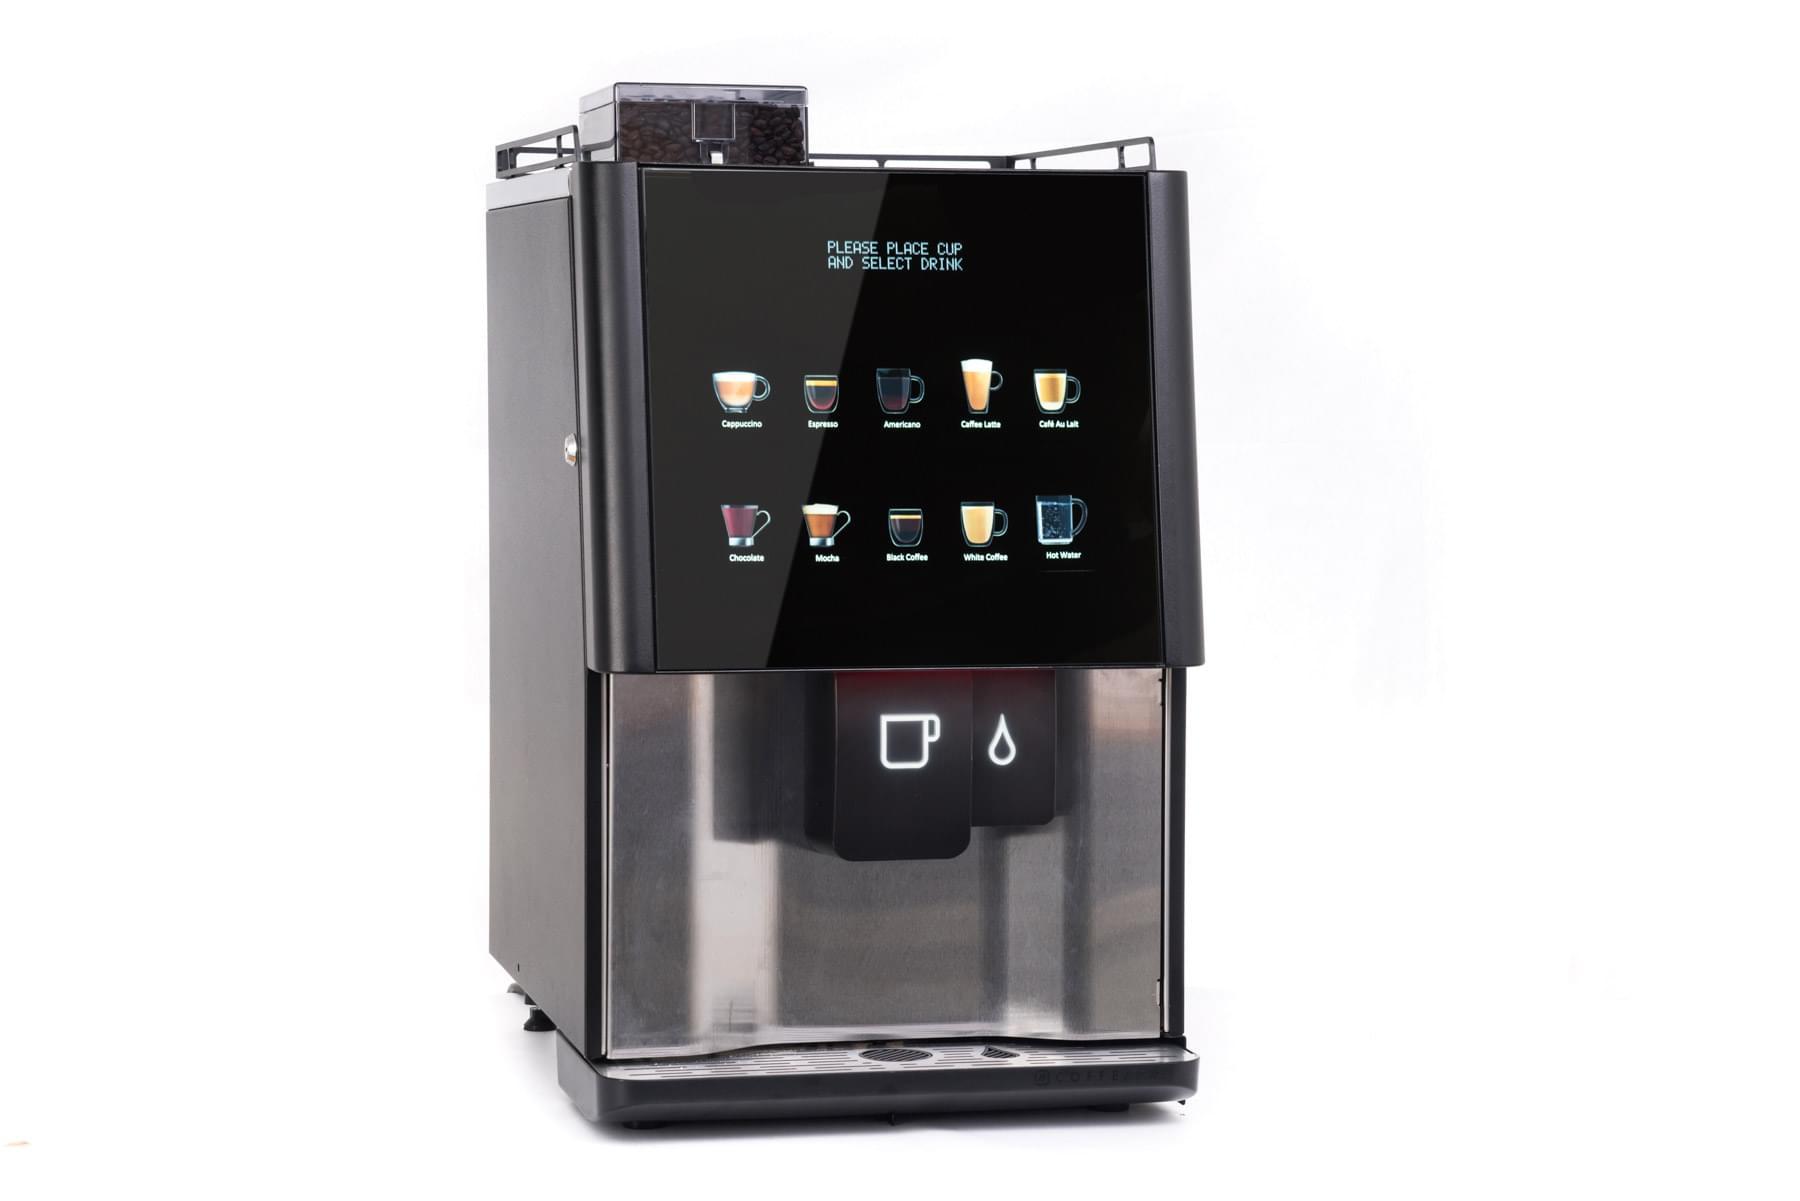 Coffetek Vitro X3 Espresso Dry Milk Espresso Coffee